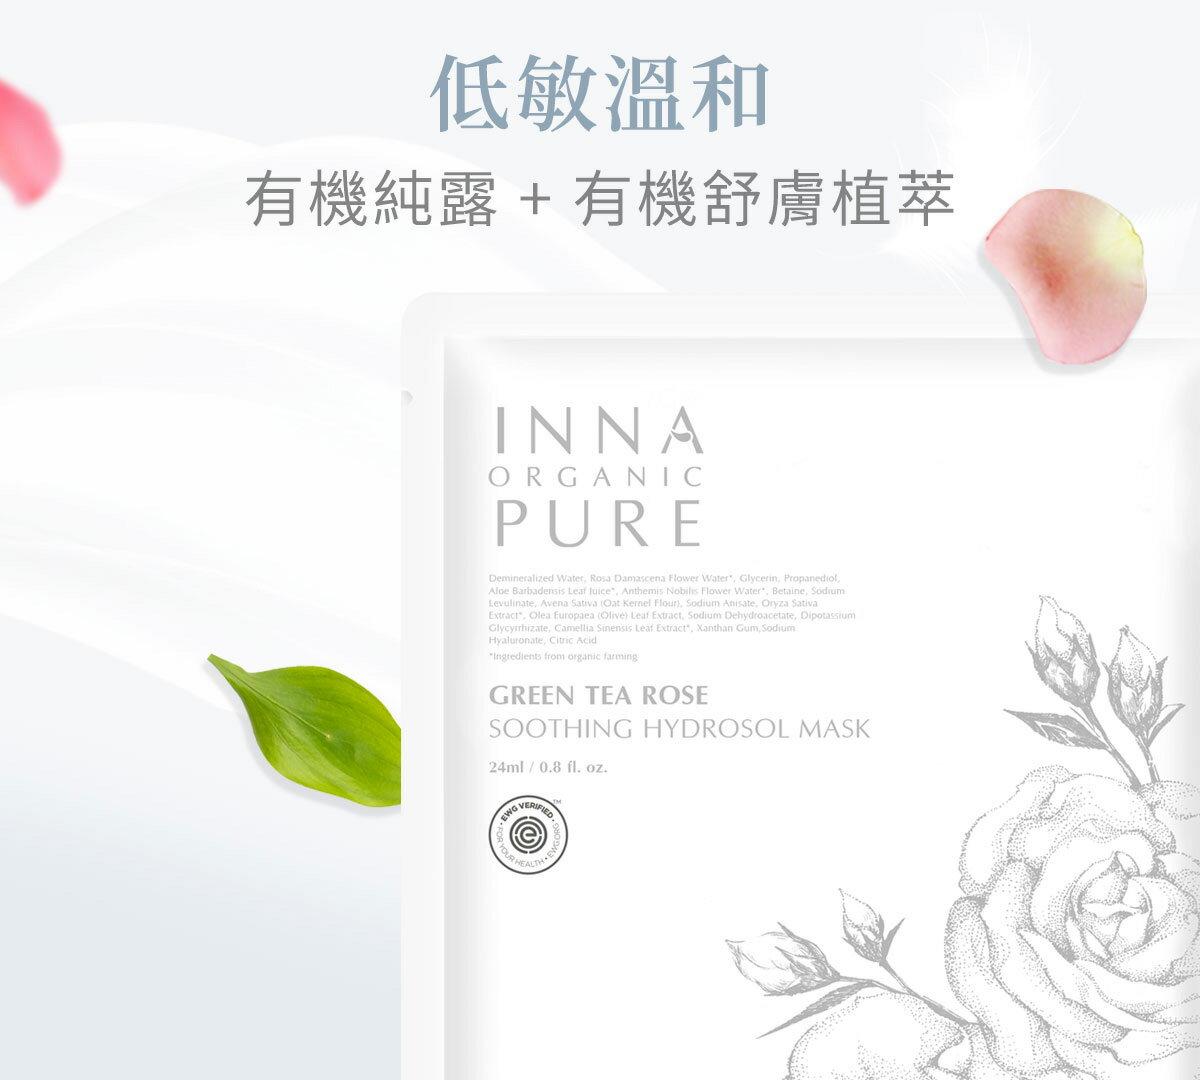 MIT👍滿額贈♥️【Inna Organic 童顏有機】綠茶玫瑰舒膚純露面膜 (1片) 2